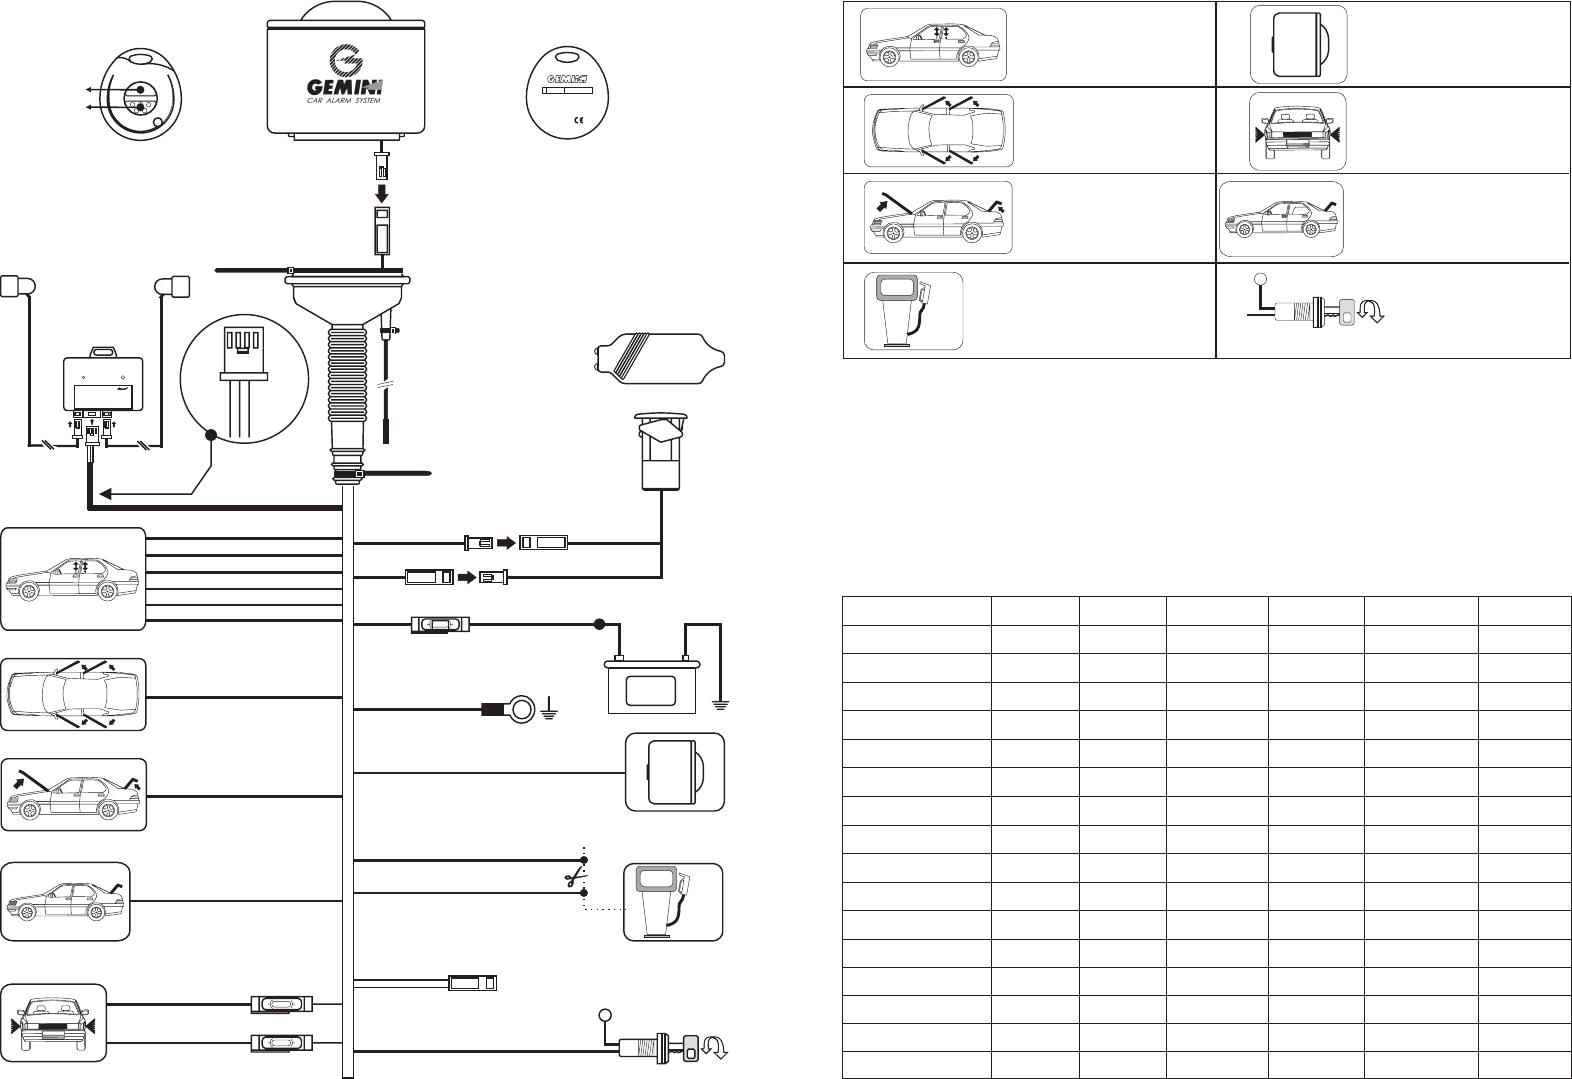 Manual Gemini 7350 (page 3 of 10) (English)   Gemini Car Alarm Wiring Diagram      Libble.eu